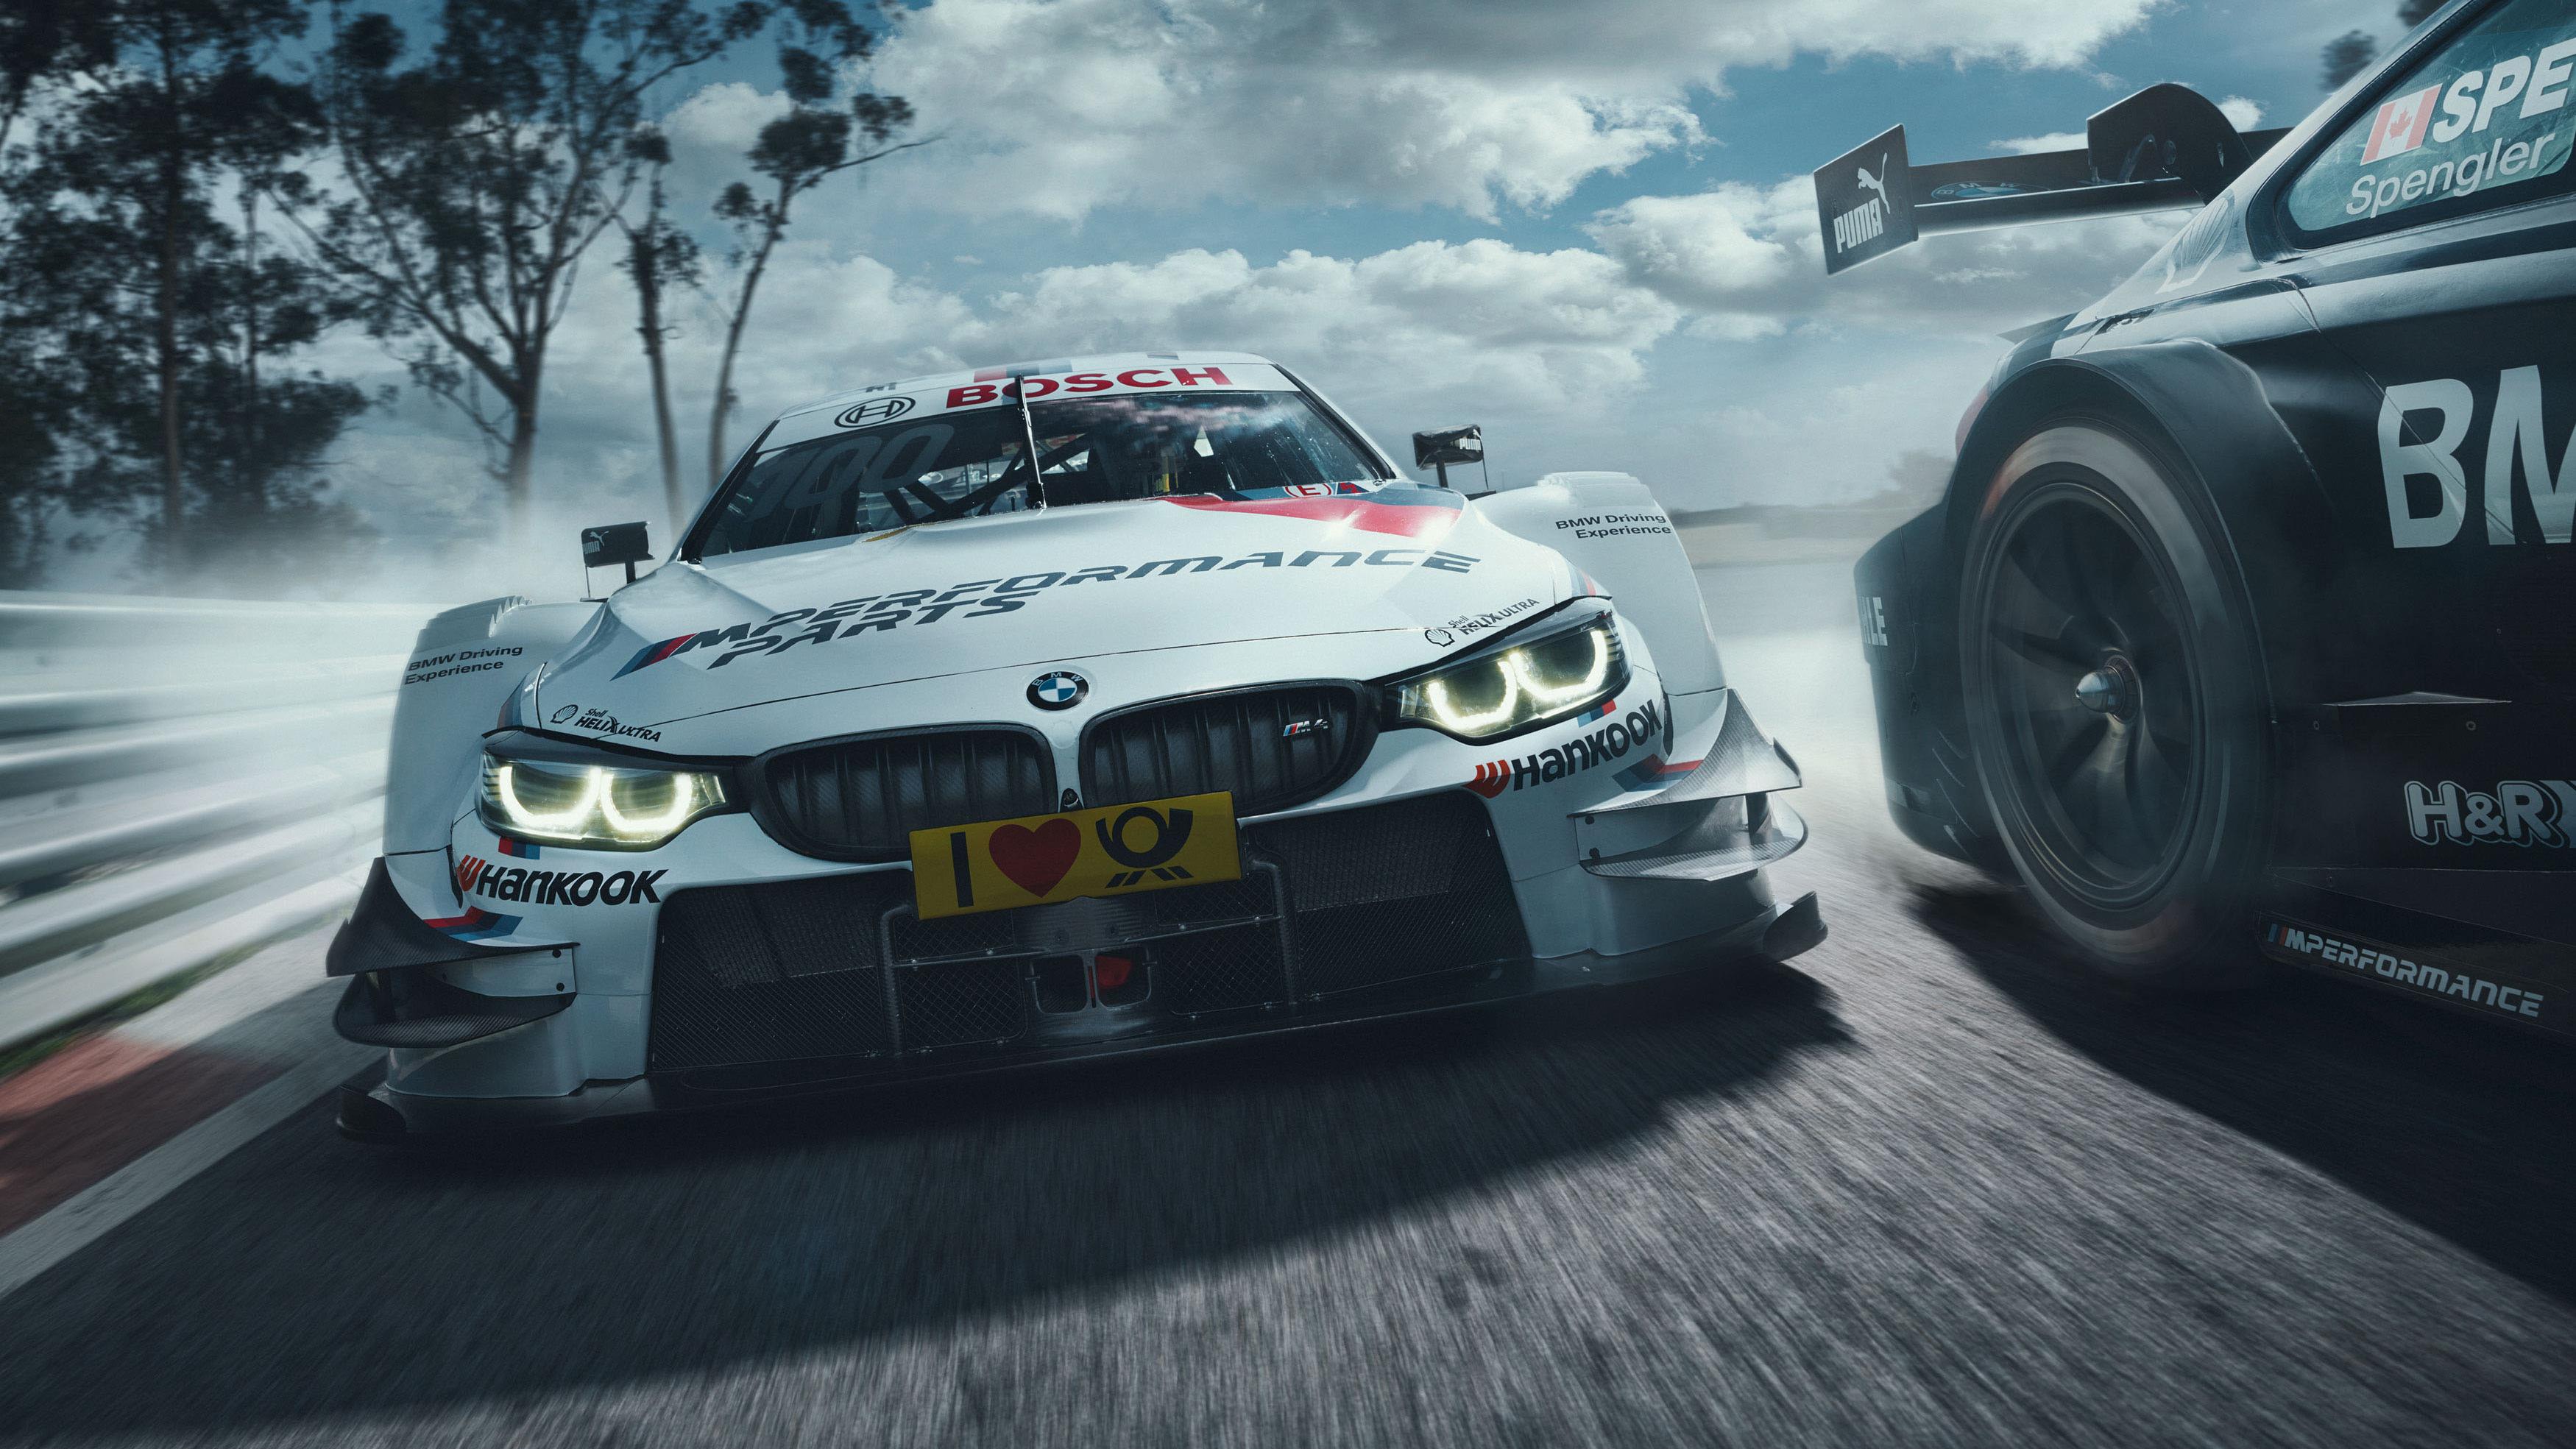 Wallpaper Motor Sport Android: BMW M4 DTM Motorsport Wallpaper